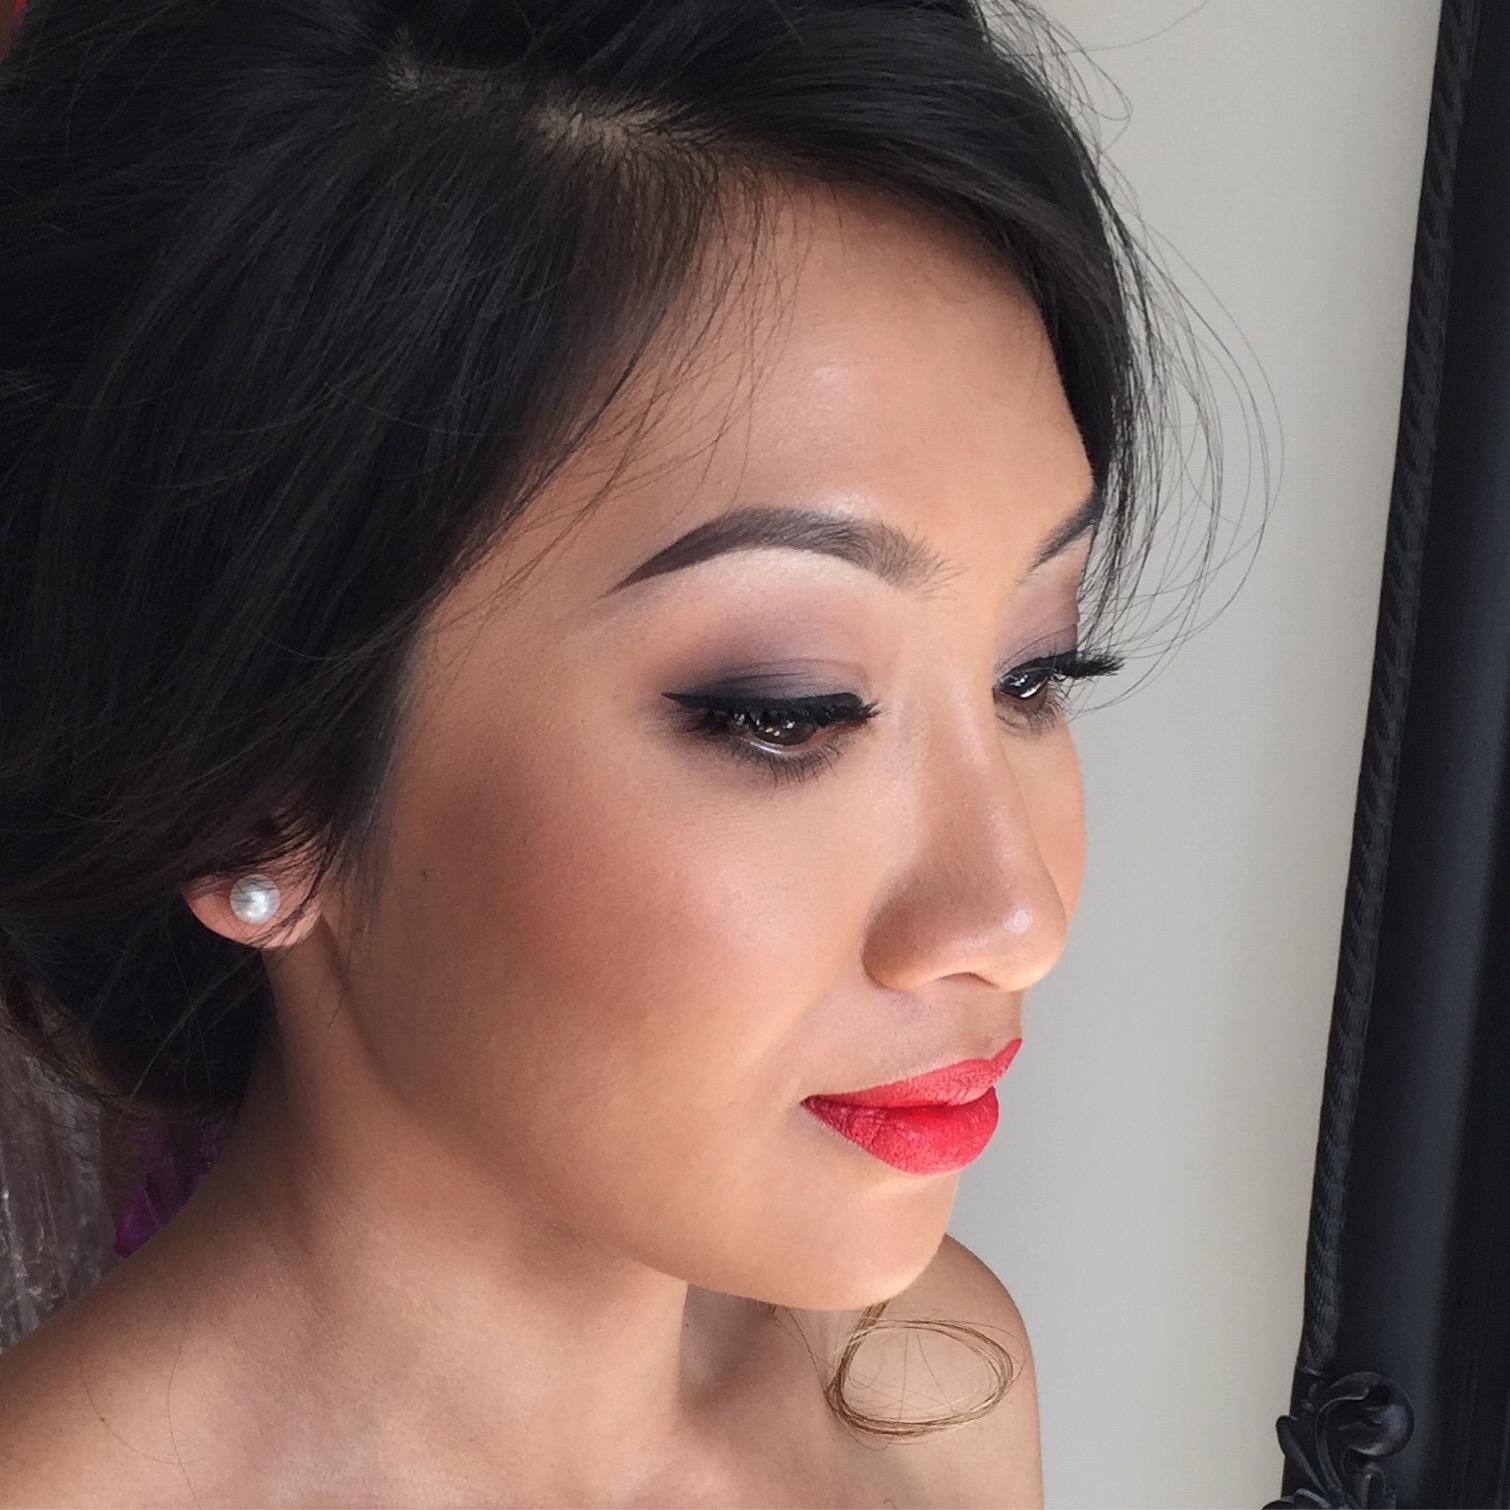 Hair & Makeup by Tamara